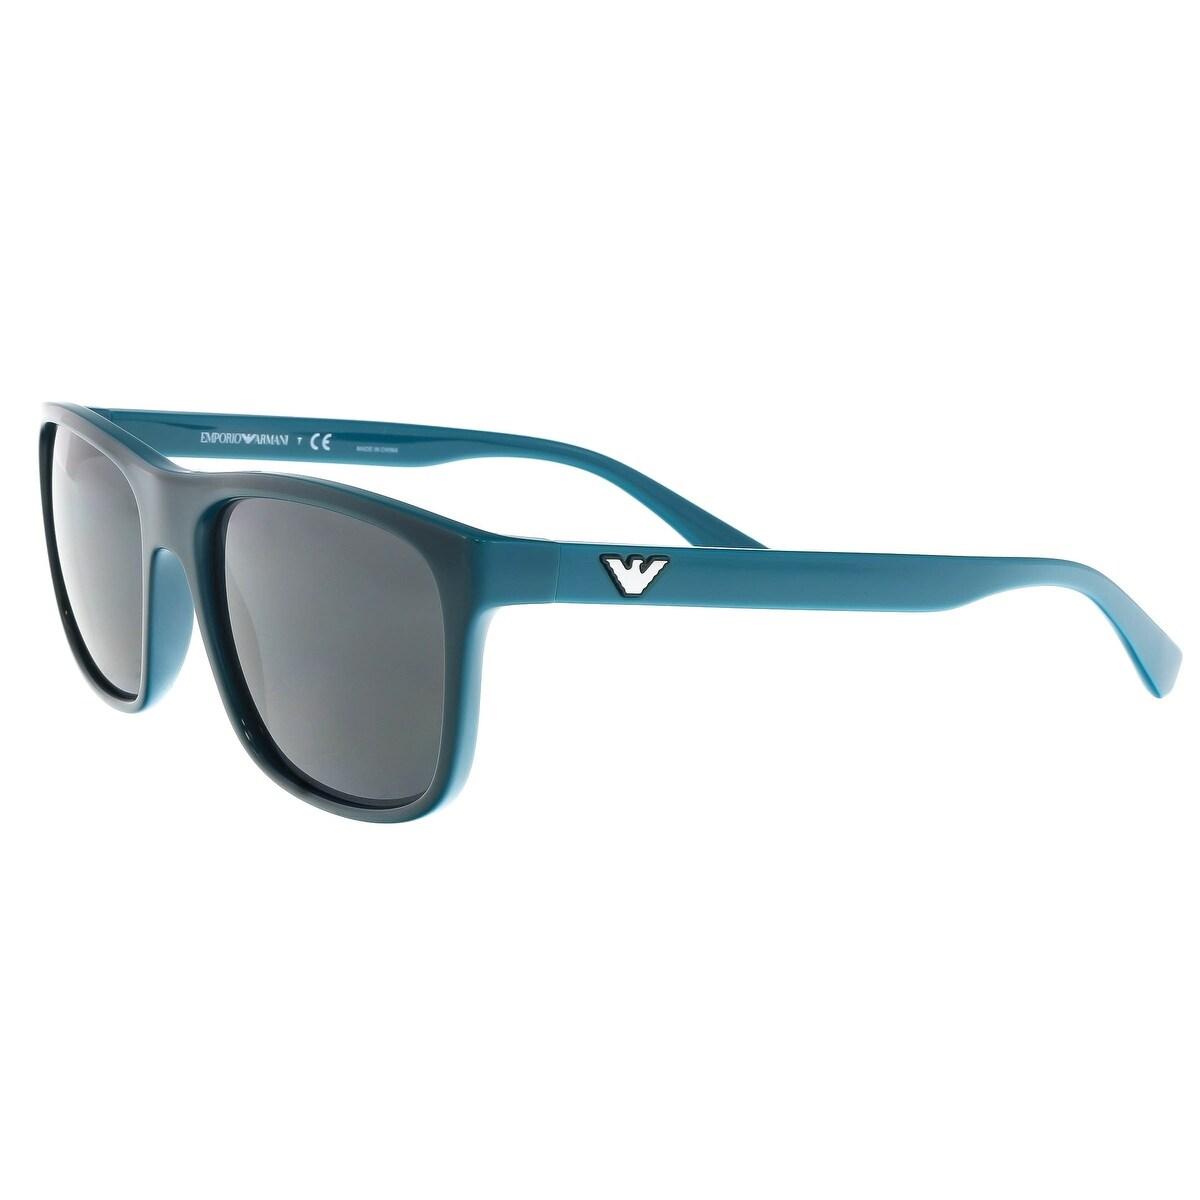 06d148835b Shop Emporio Armani EA4085 555487 Teal Square Sunglasses - 56-18-145 - Free  Shipping Today - Overstock.com - 19518860